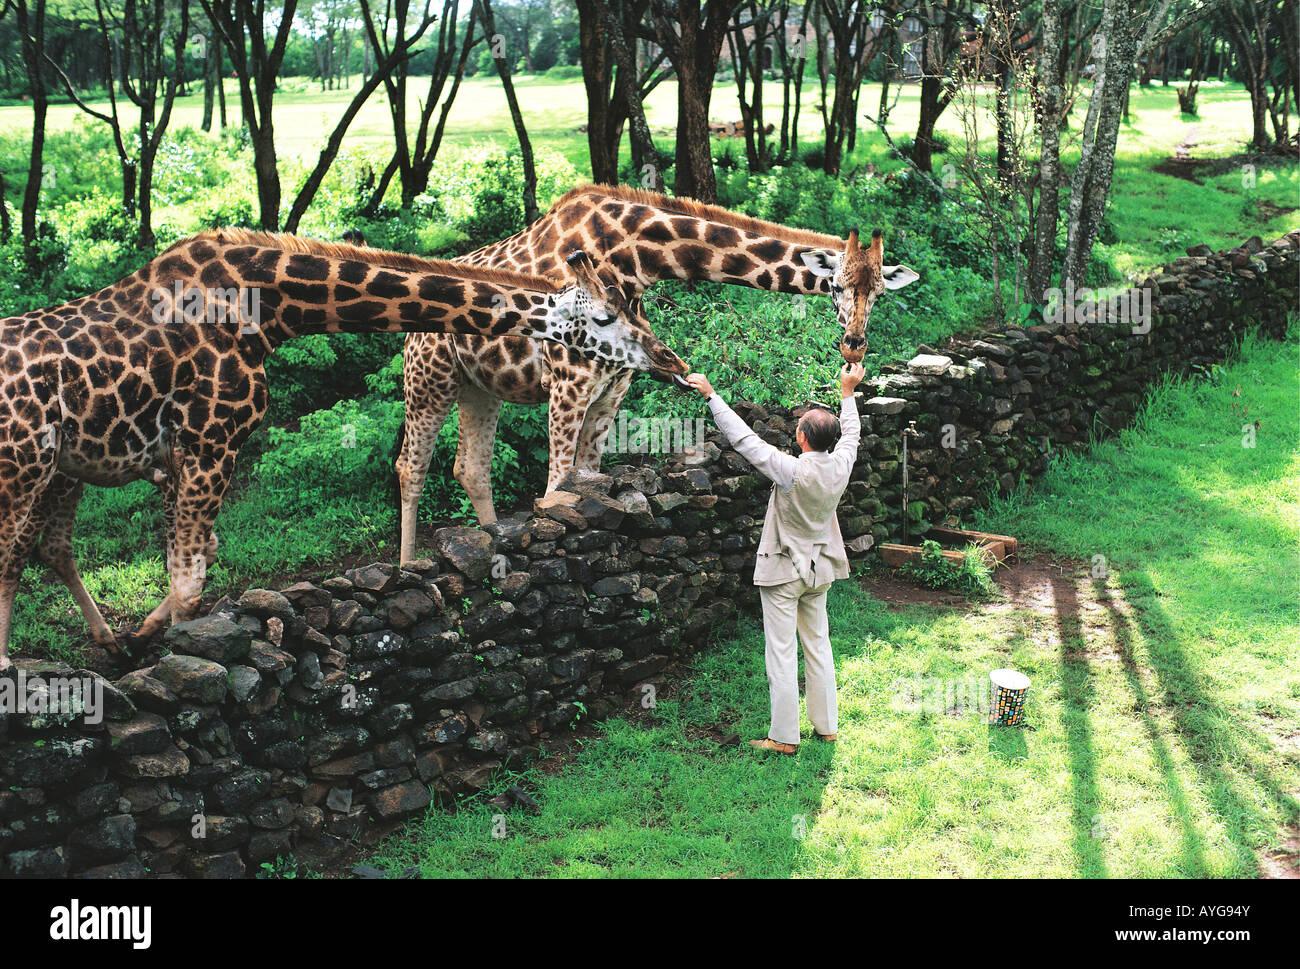 Rothschild s Giraffe being fed by white male man in safari suite at Giraffe Manor Nairobi Kenya East Africa - Stock Image